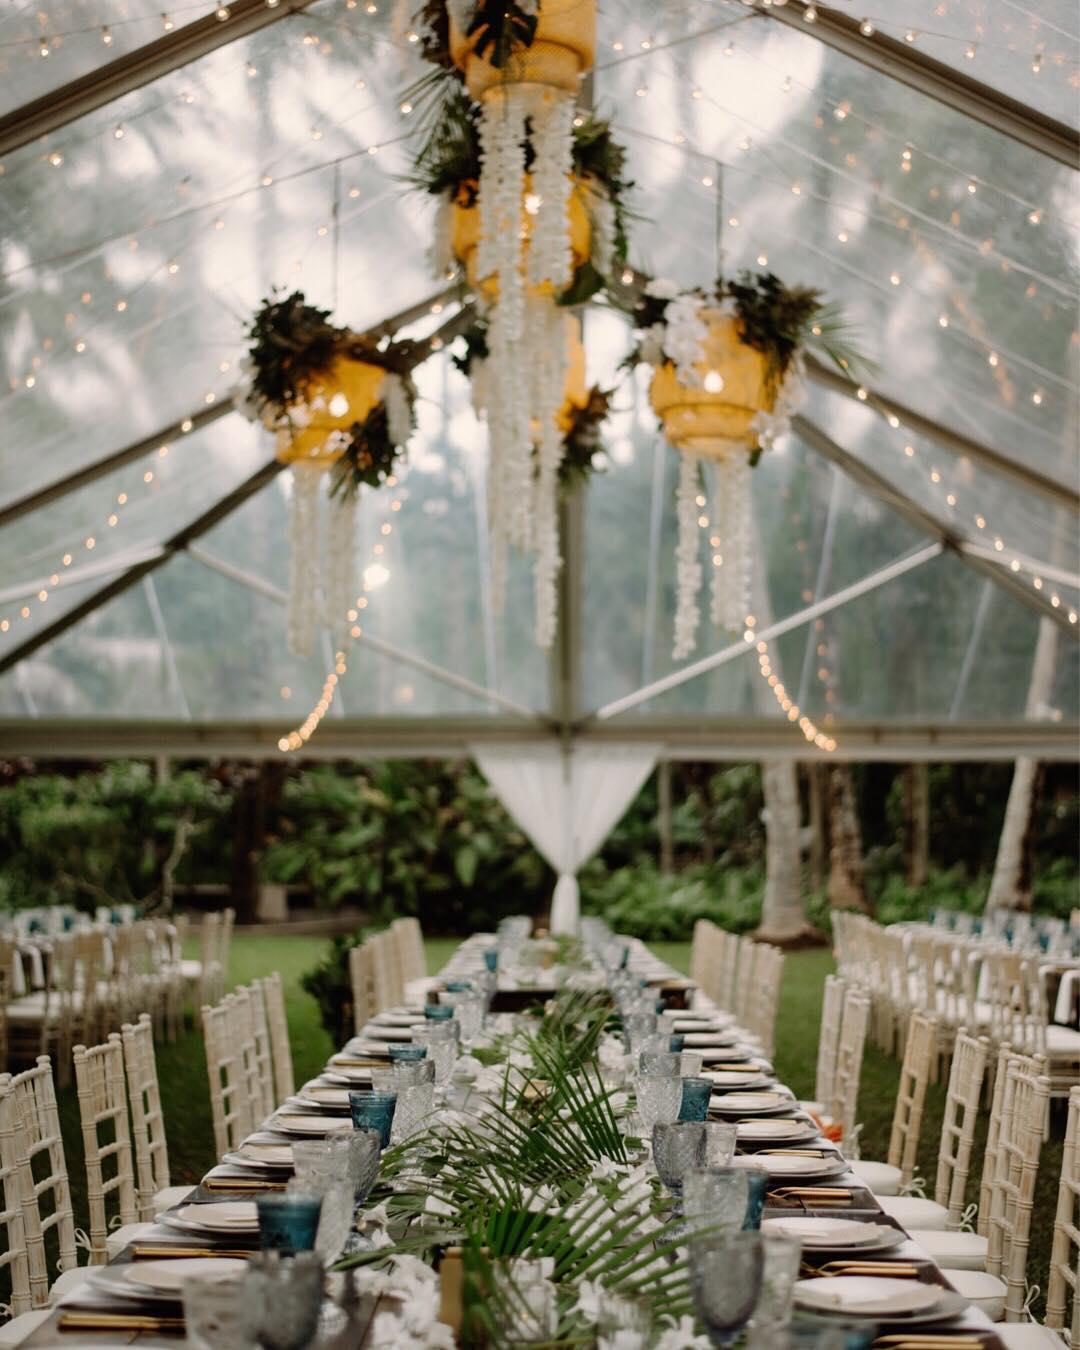 1 Well Travelled Bride Roam Rentals Wedding Hire Services Hawaii.jpg